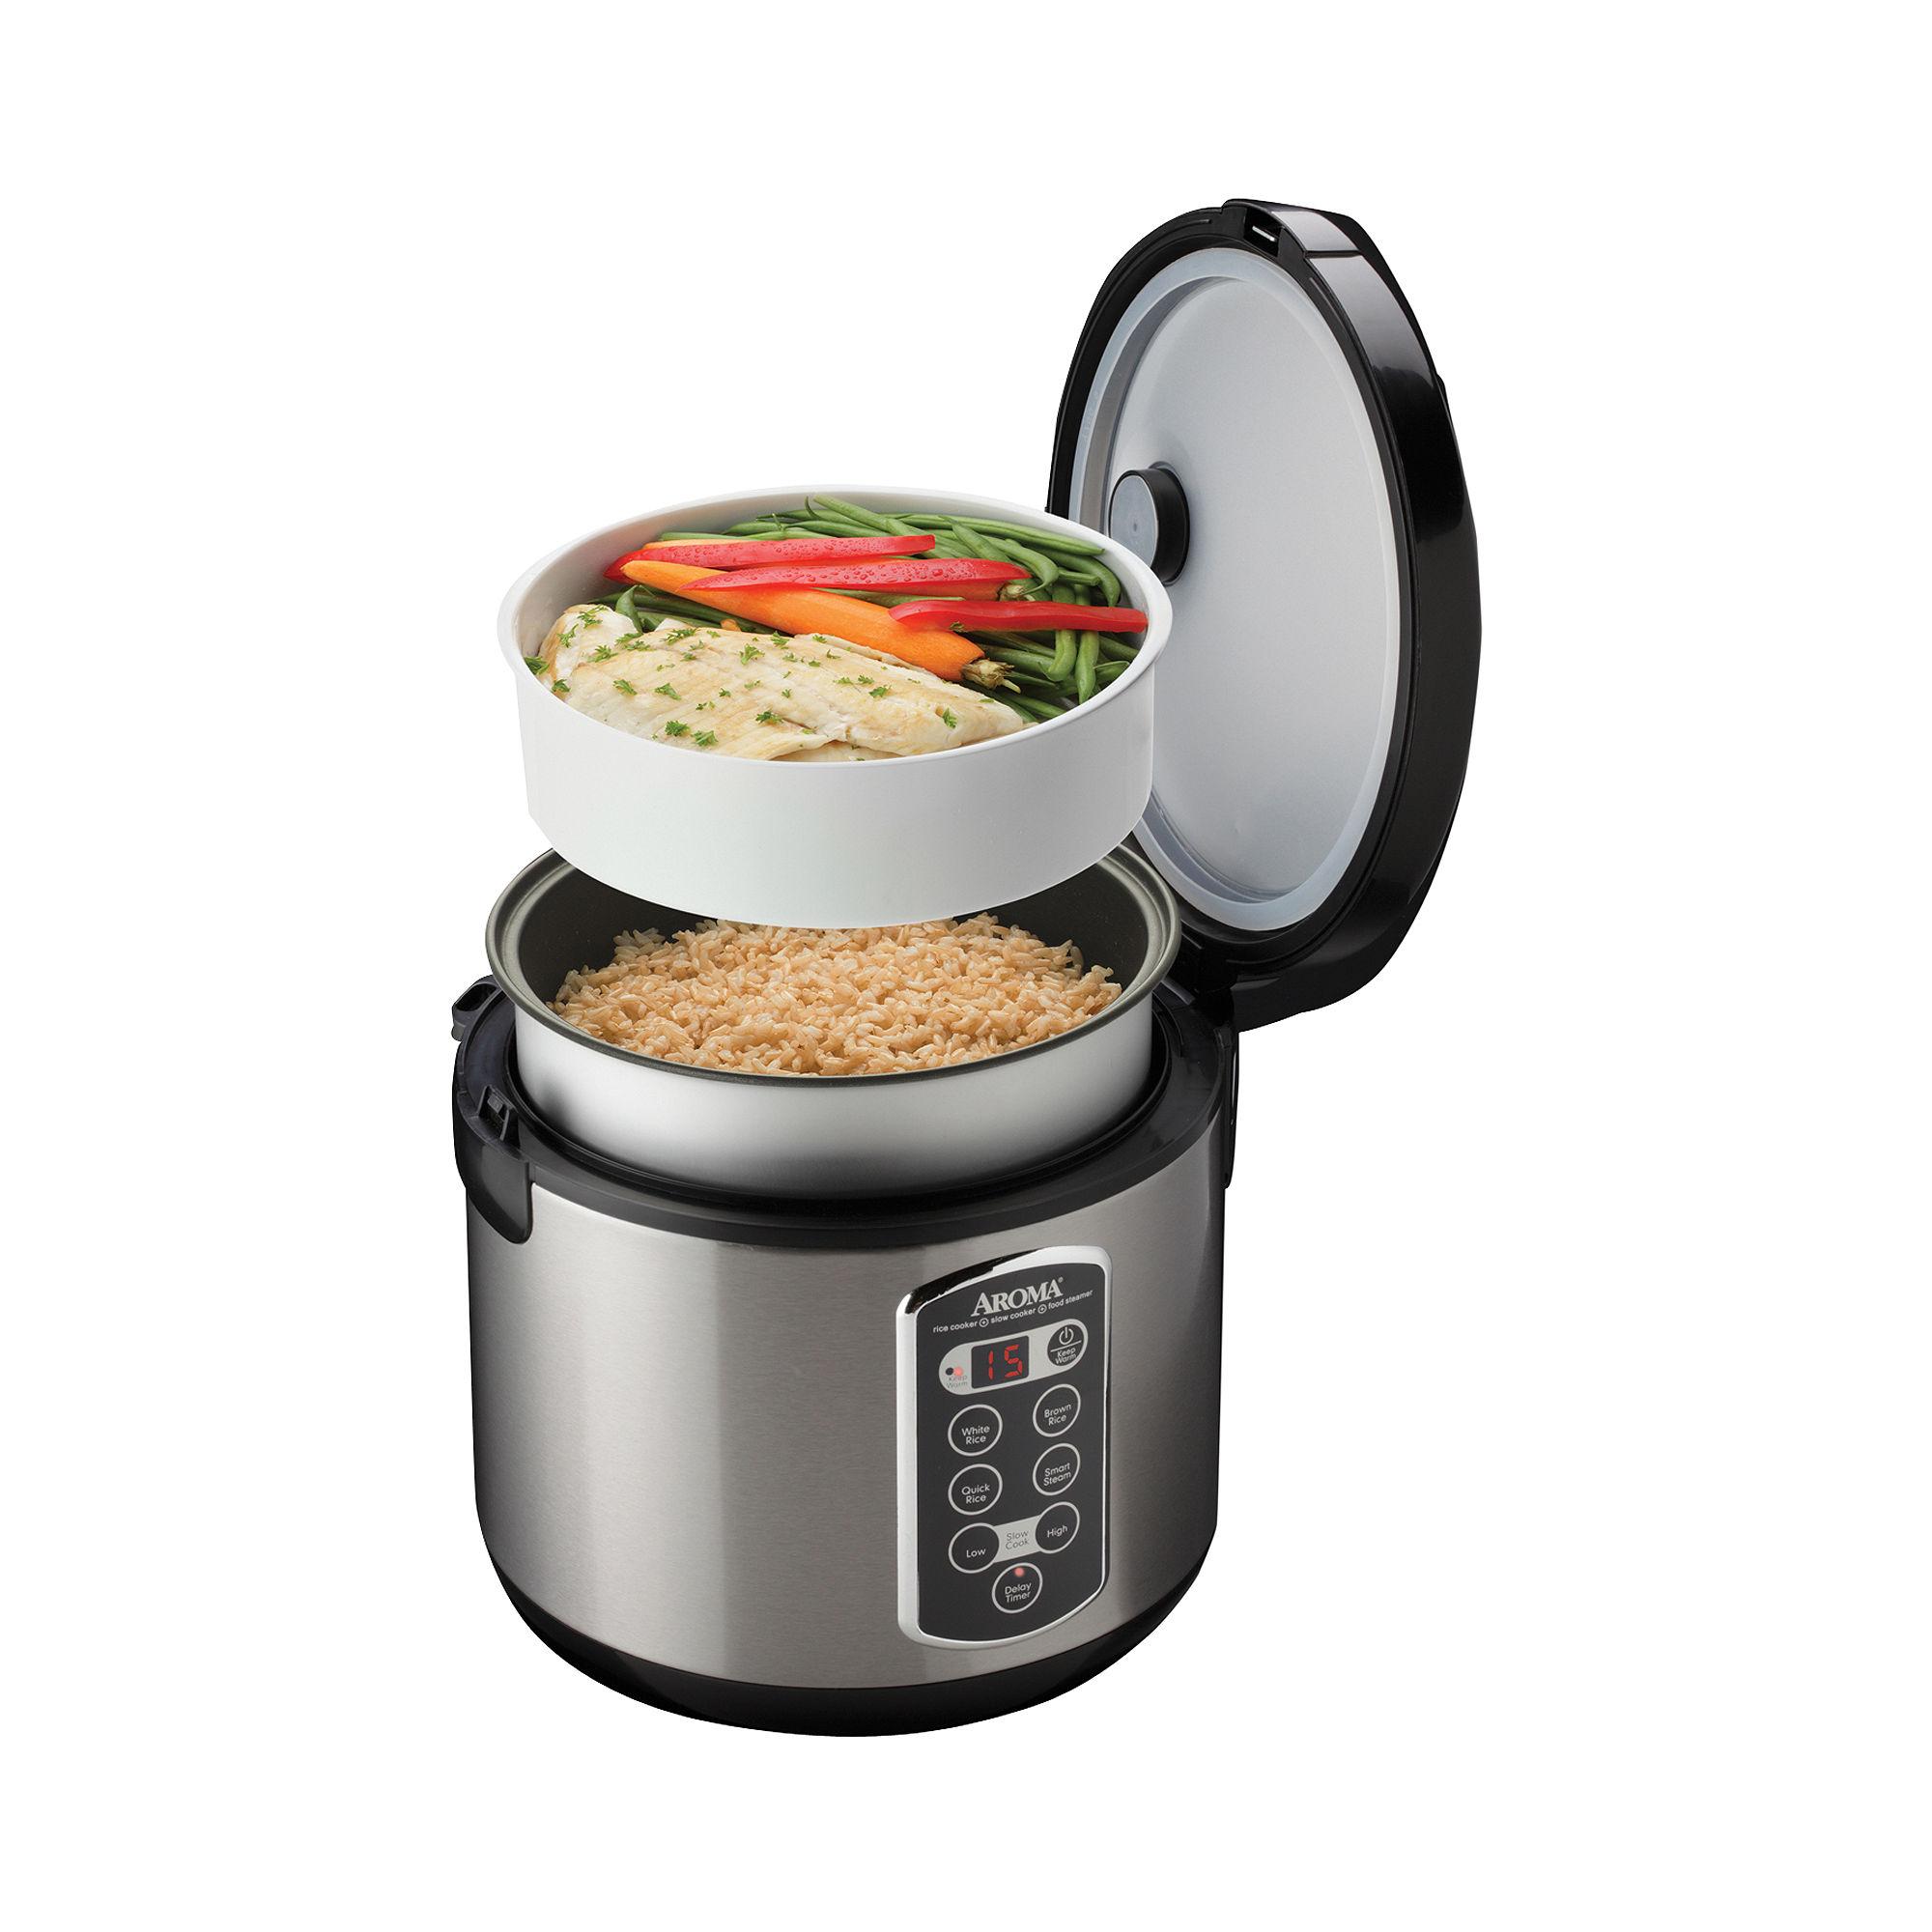 Aroma 20-Cup Sensor Logic Rice Cooker & Steamer